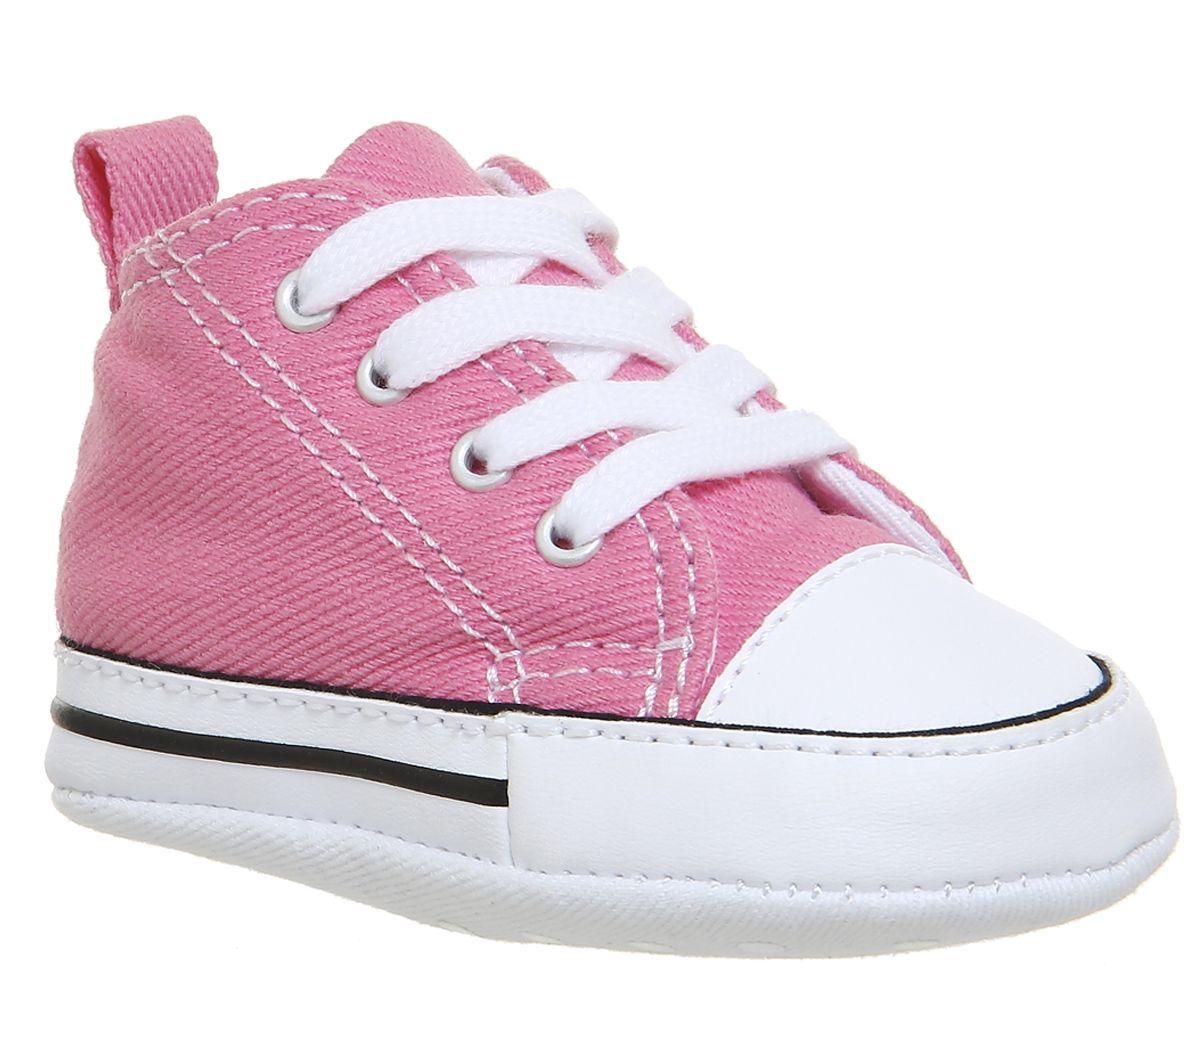 1f3a47e68839 Converse First Star Pink Canvas - Unisex